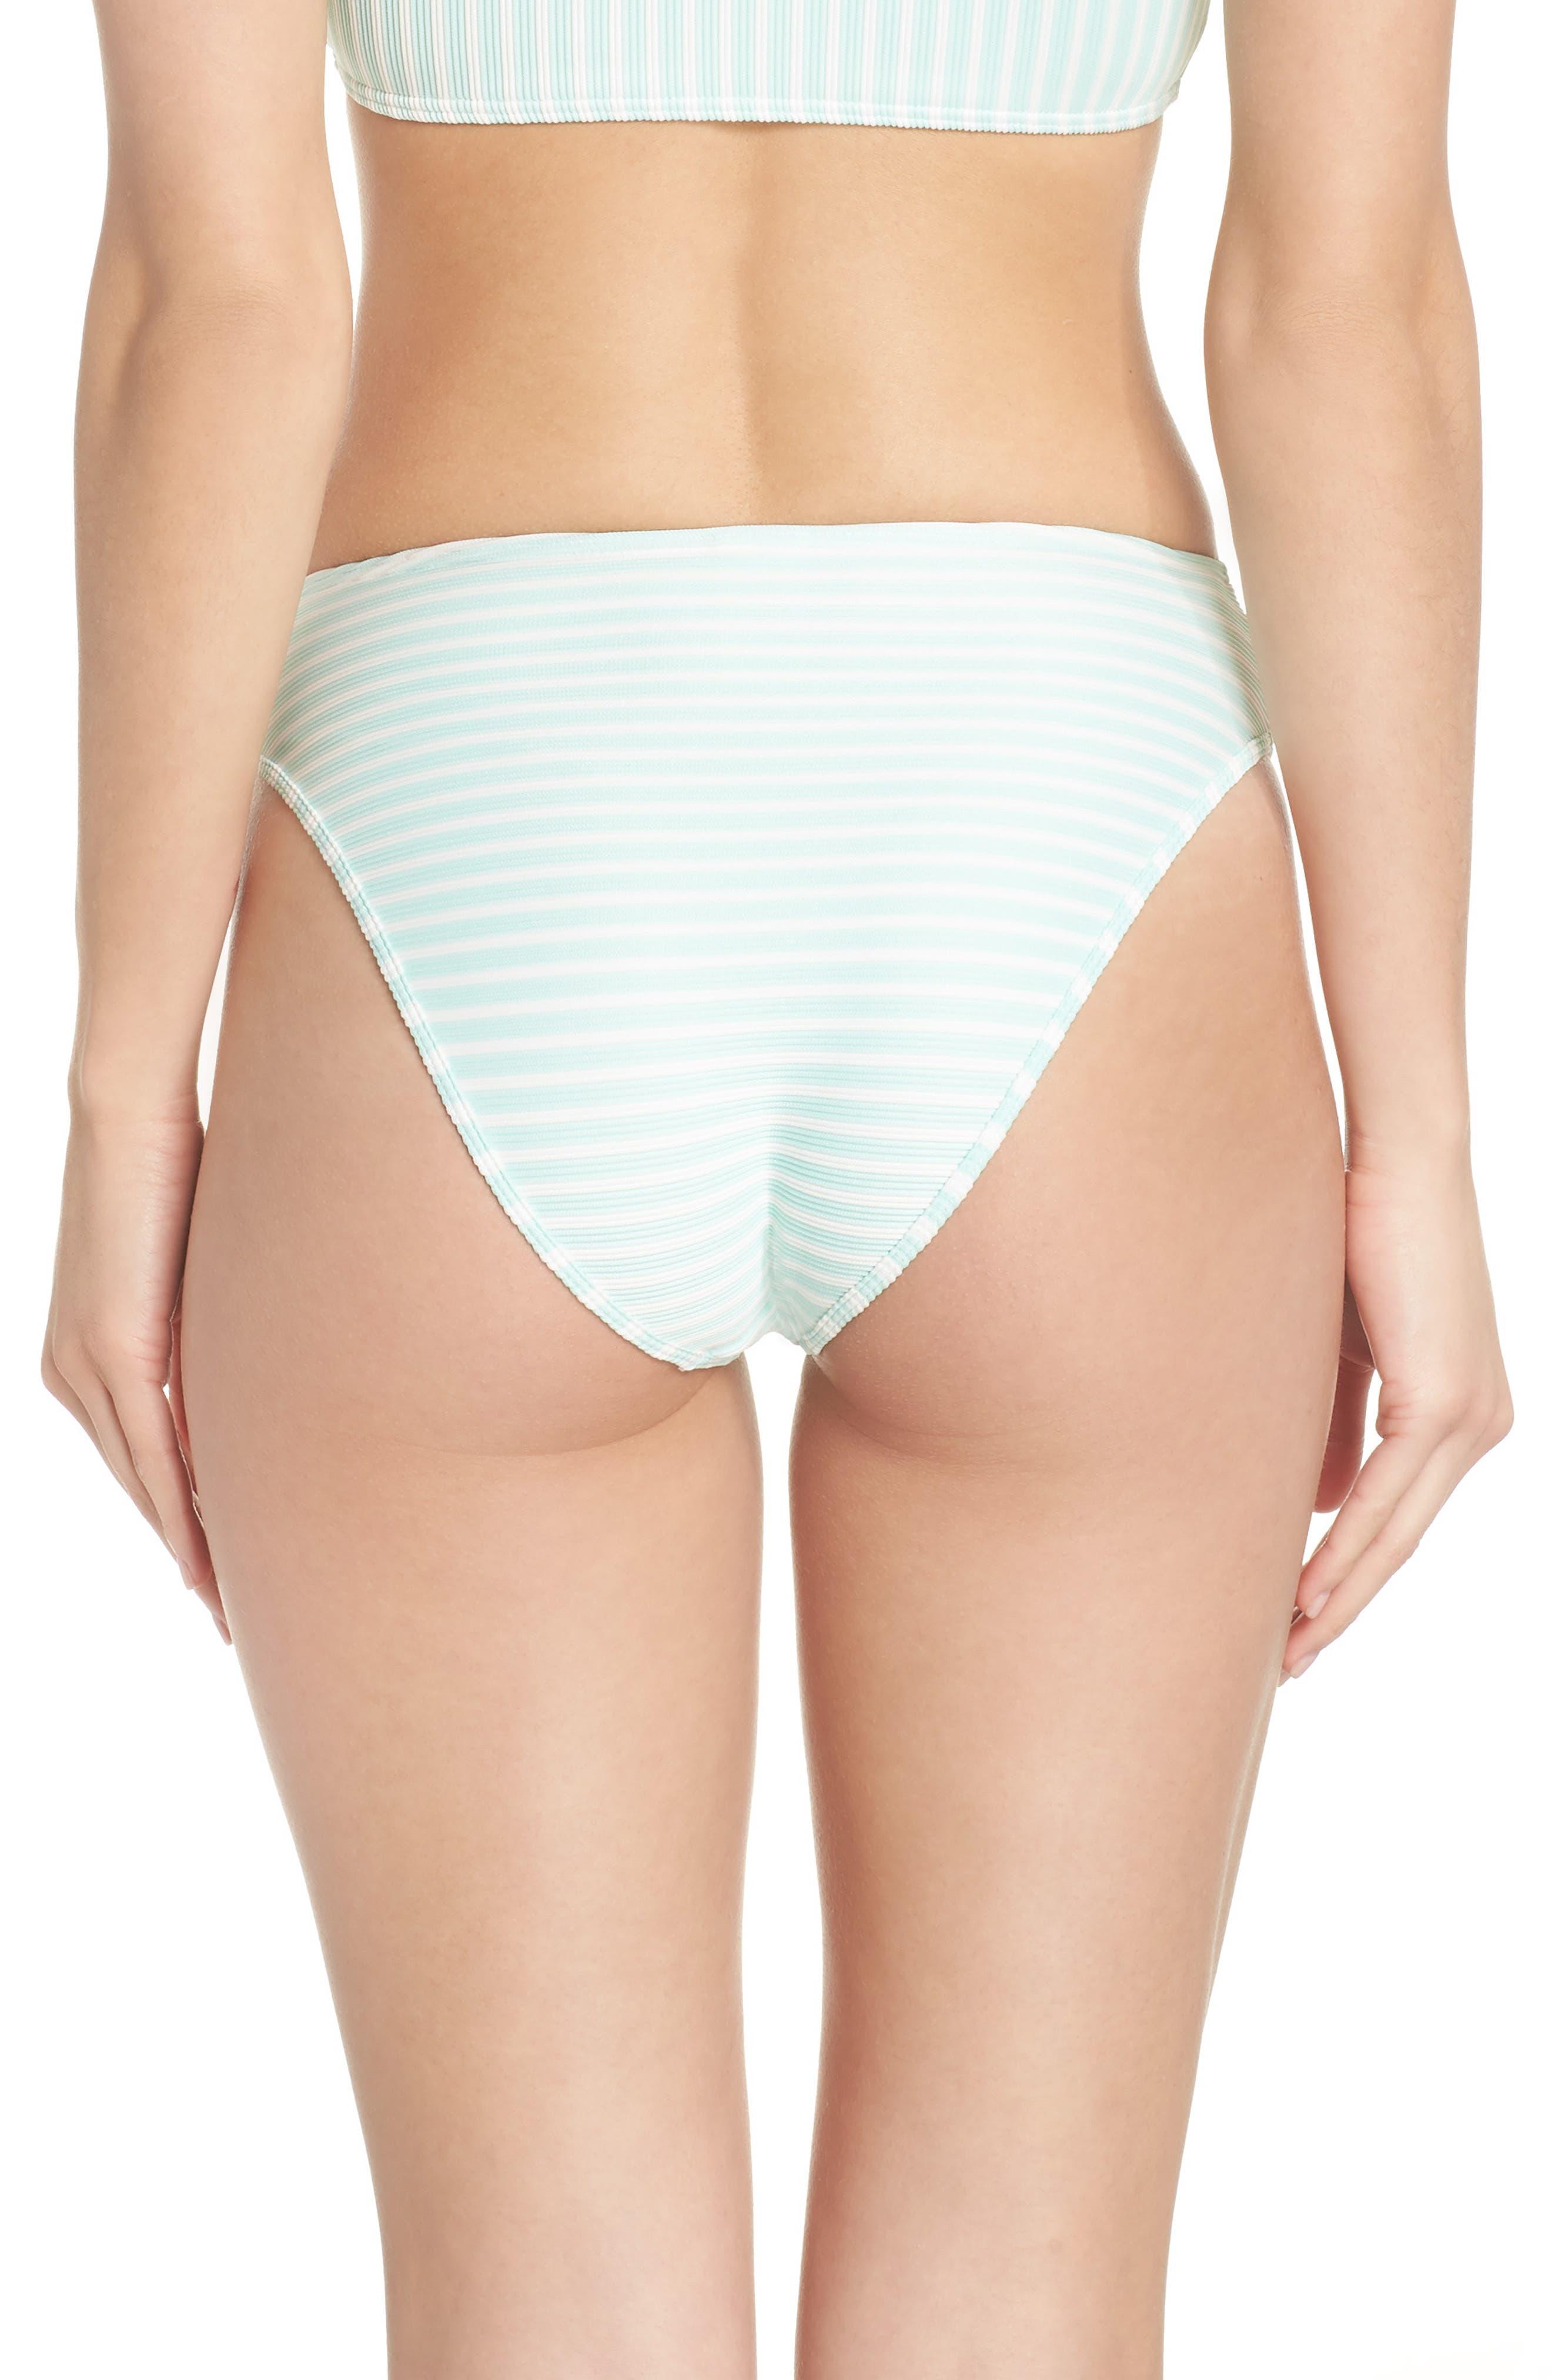 Pierre High Waist Bikini Bottoms,                             Alternate thumbnail 2, color,                             Spearmint